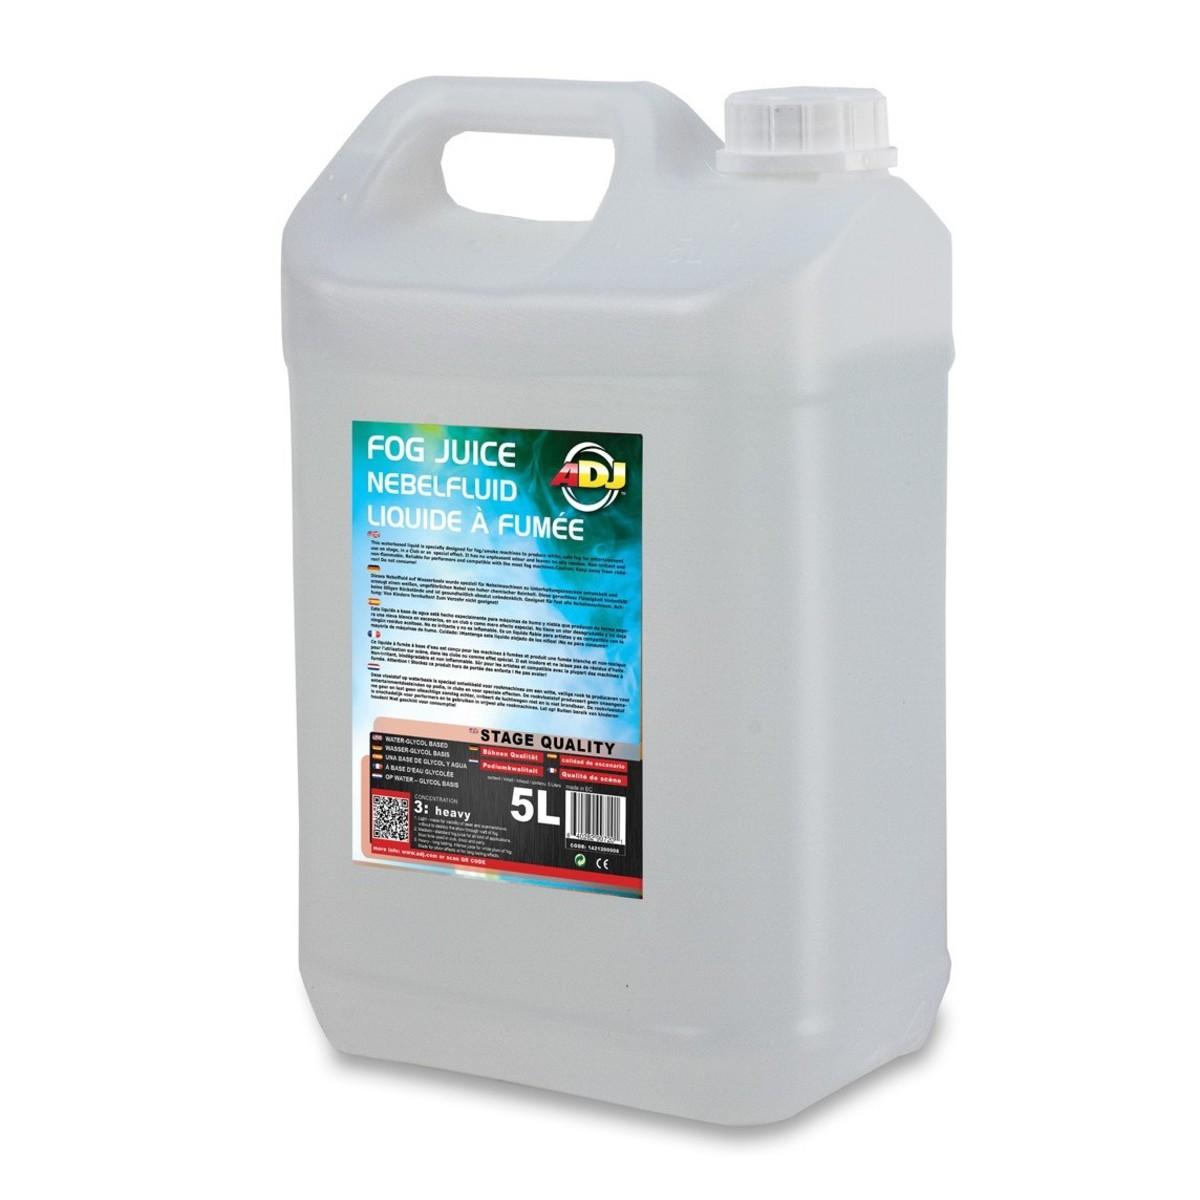 Image of ADJ Fog Juice 3 Heavy 5 Litres